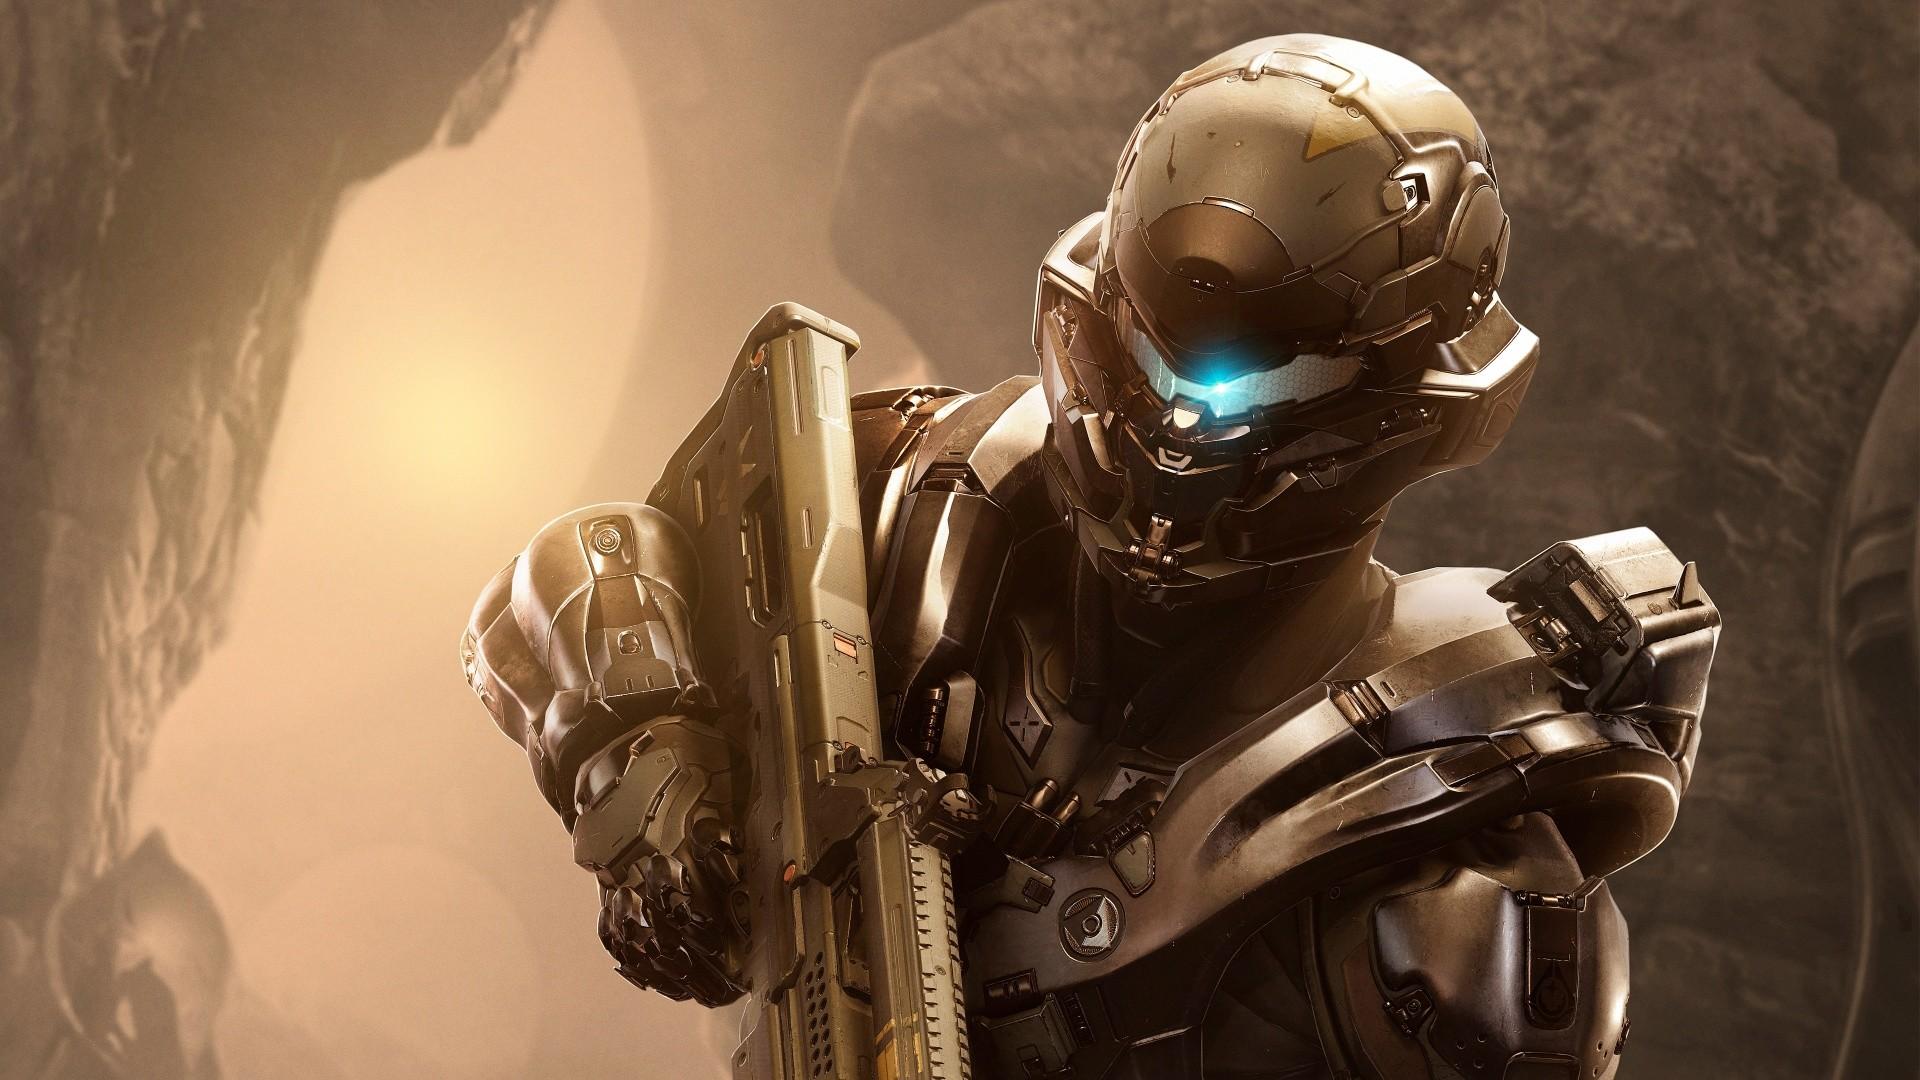 Locke Halo 5 Guardians Wallpapers   HD Wallpapers